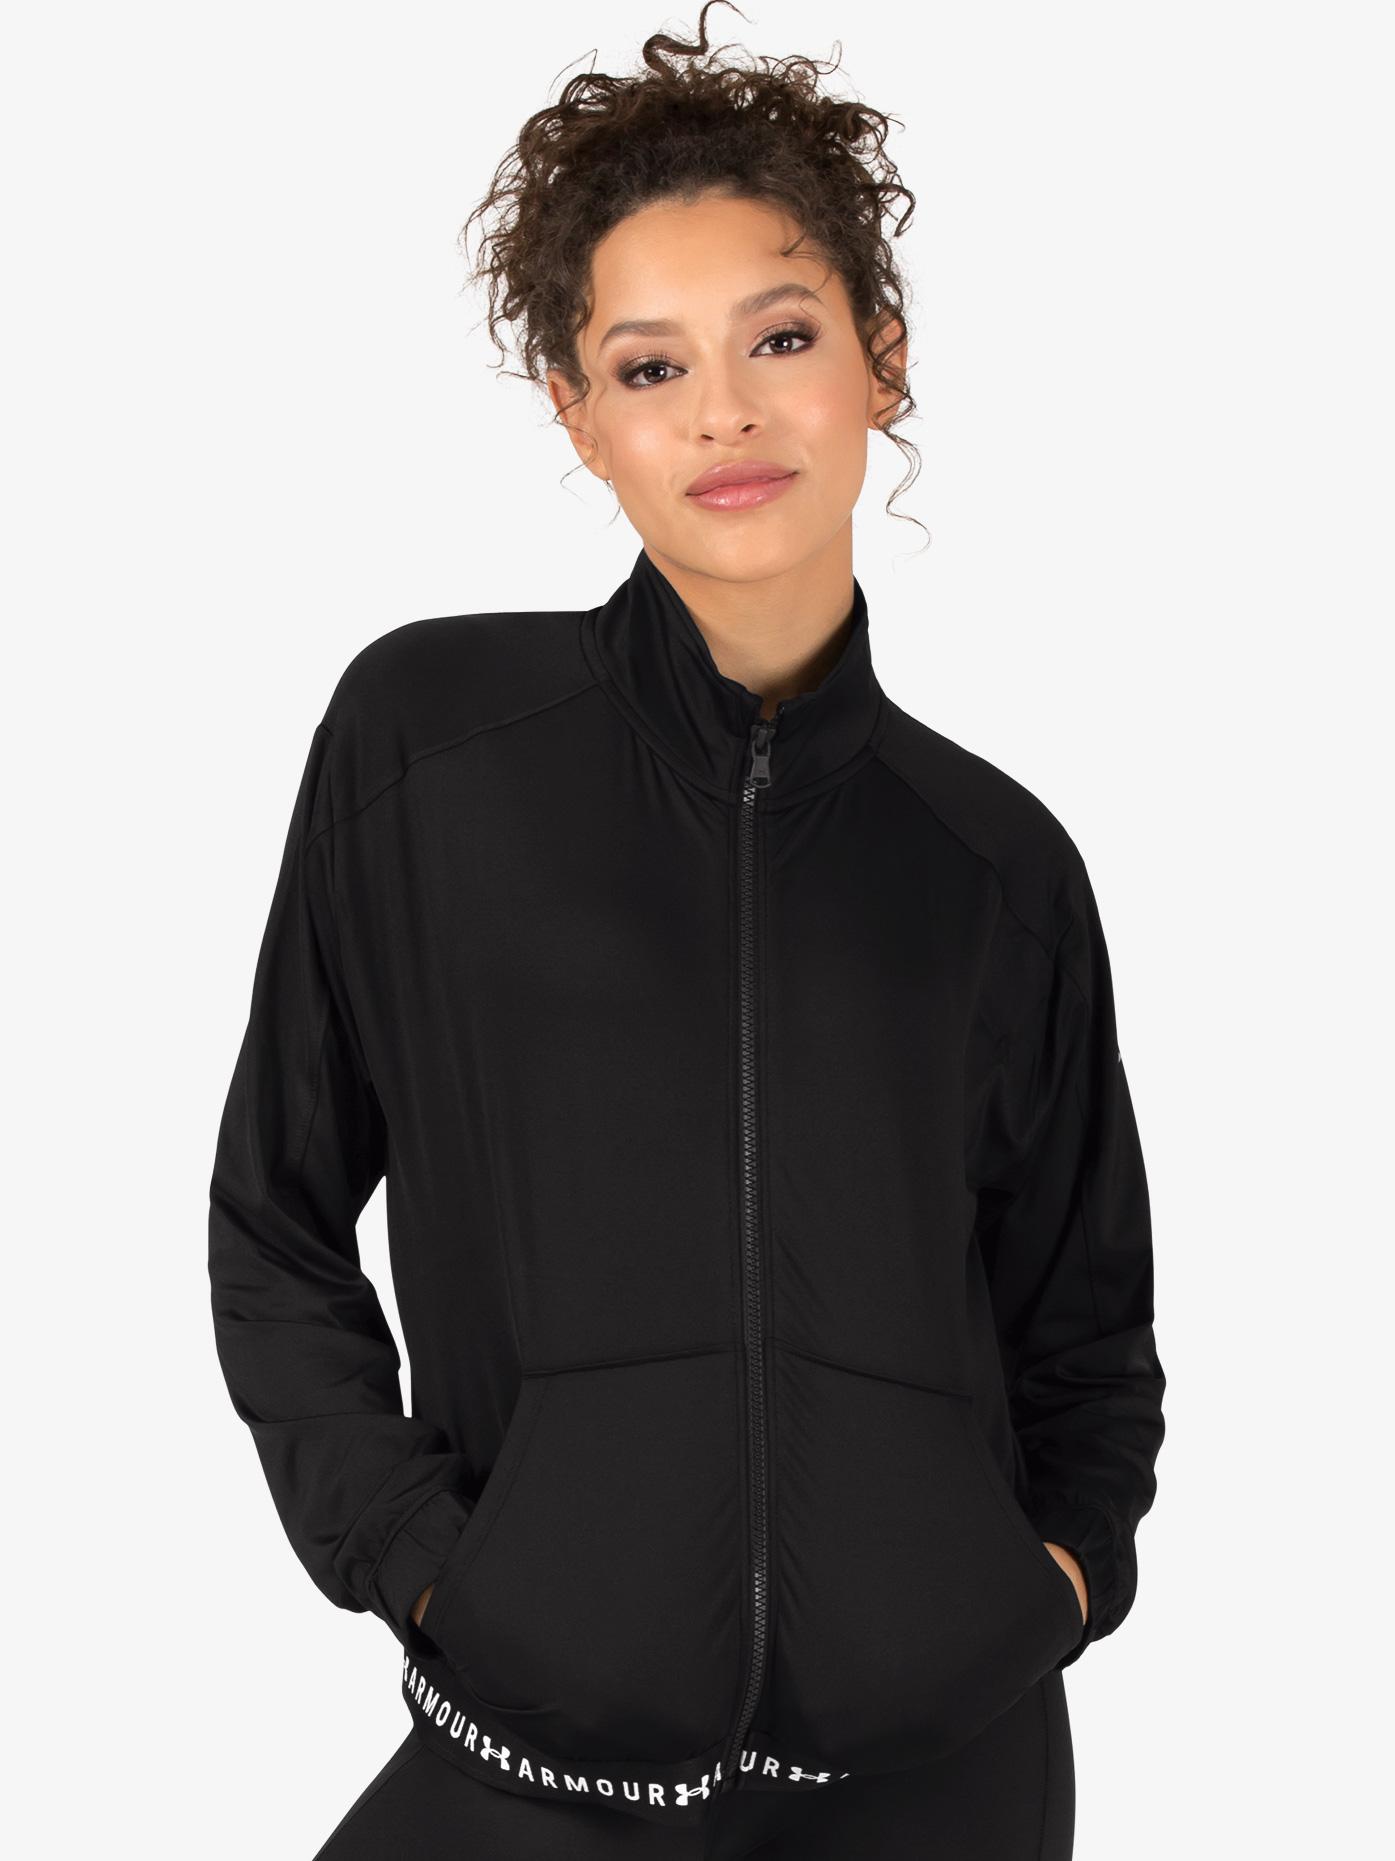 Under Armour Womens Logo Print Full Zip Workout Jacket 1320589